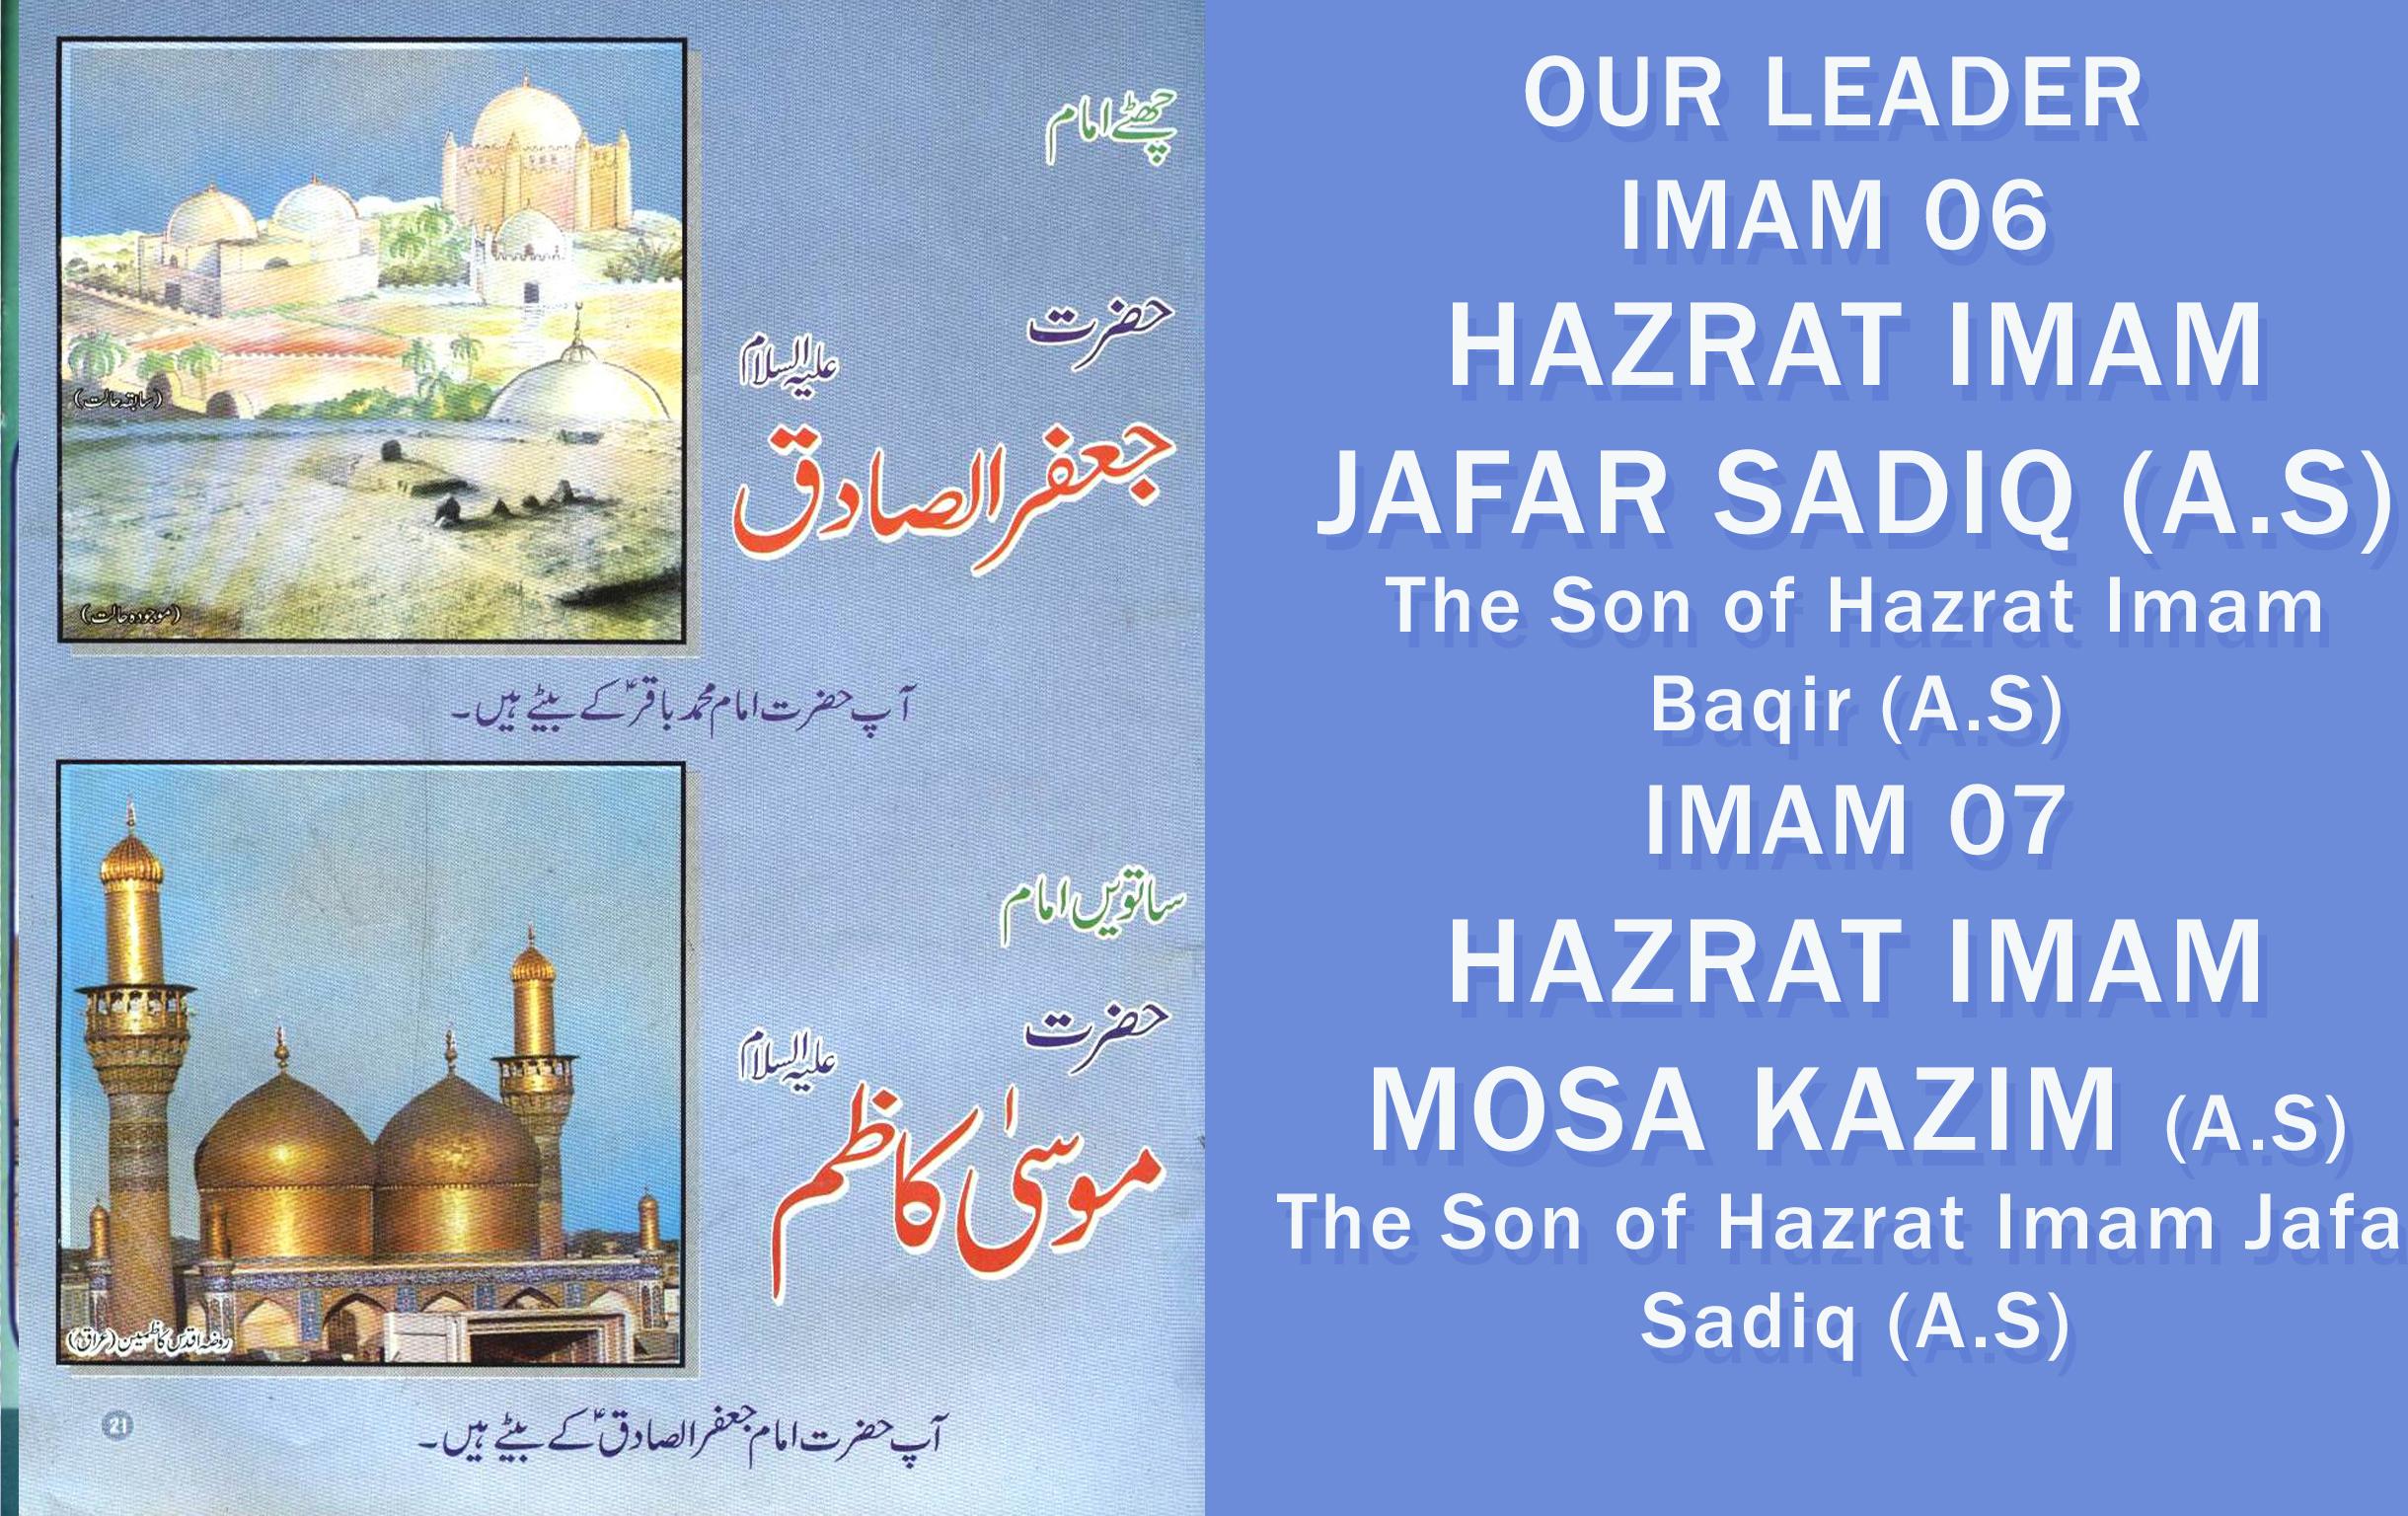 Hazrat Imam Jafir Sadiq A.S / Hazrat Imam Mosa Kazim A.S